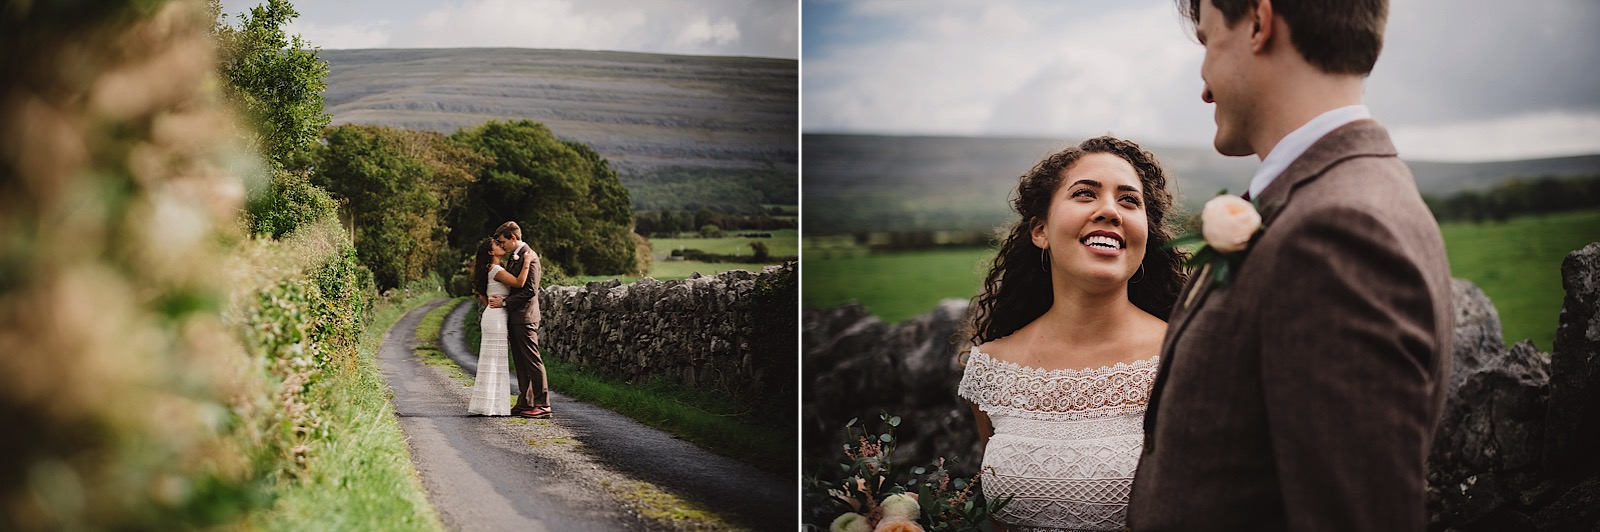 Elopement_Wedding_Ireland_Cliffs_of_moher0031